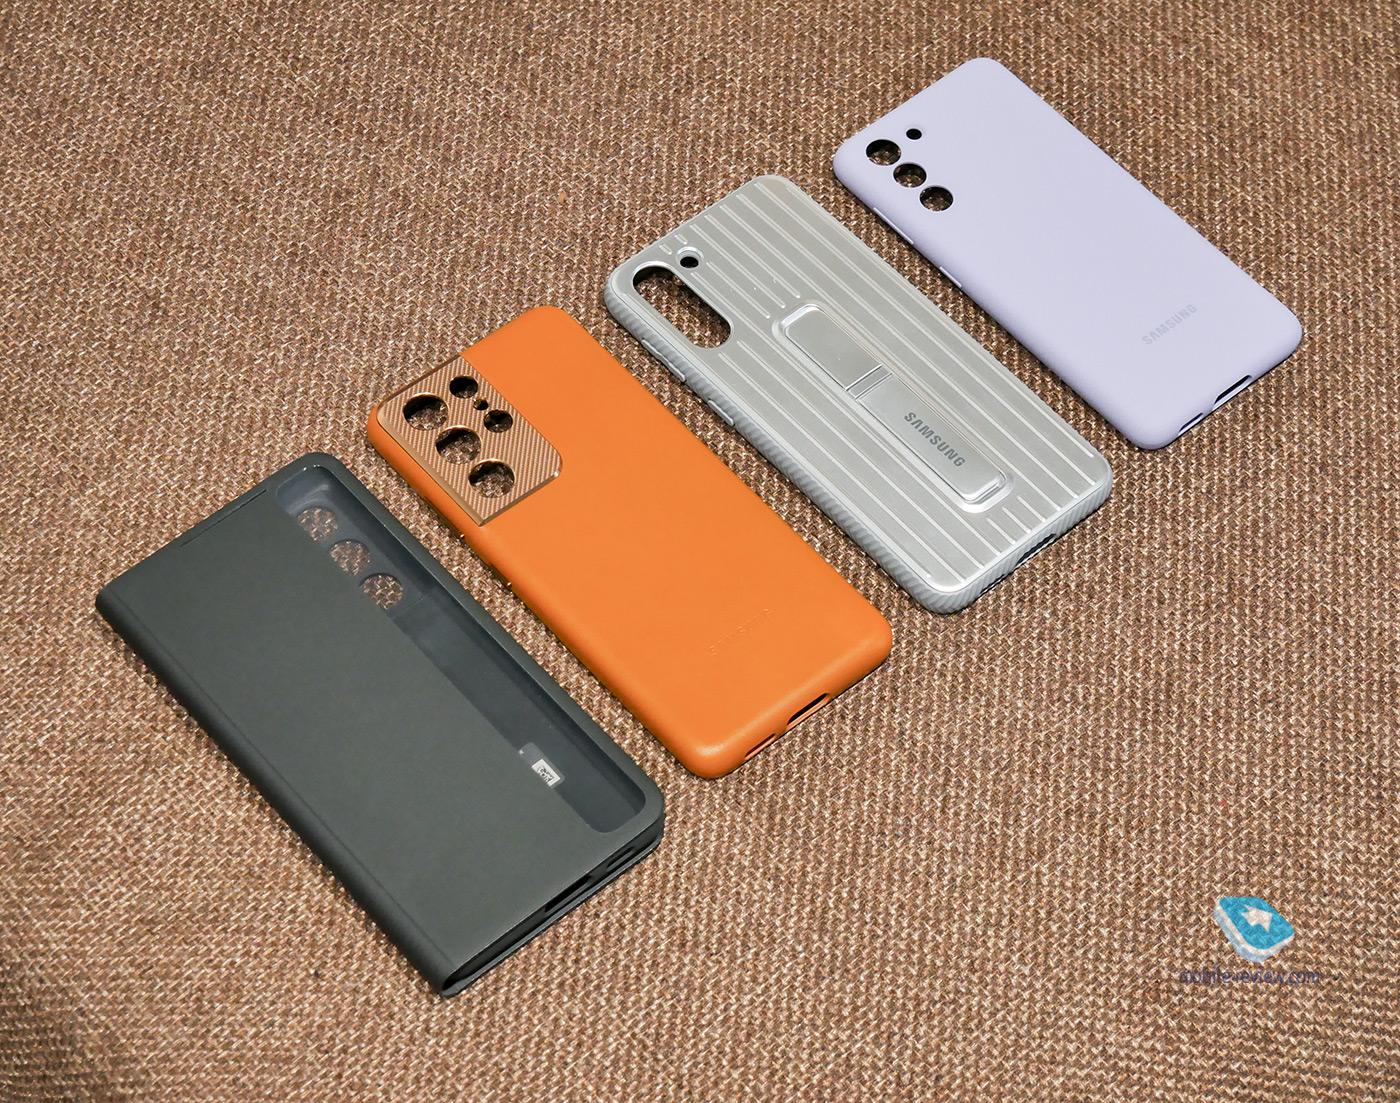 Новые флагманы от Samsung Galaxy S21, S21+, S21 Ultra и наушники Buds Pro